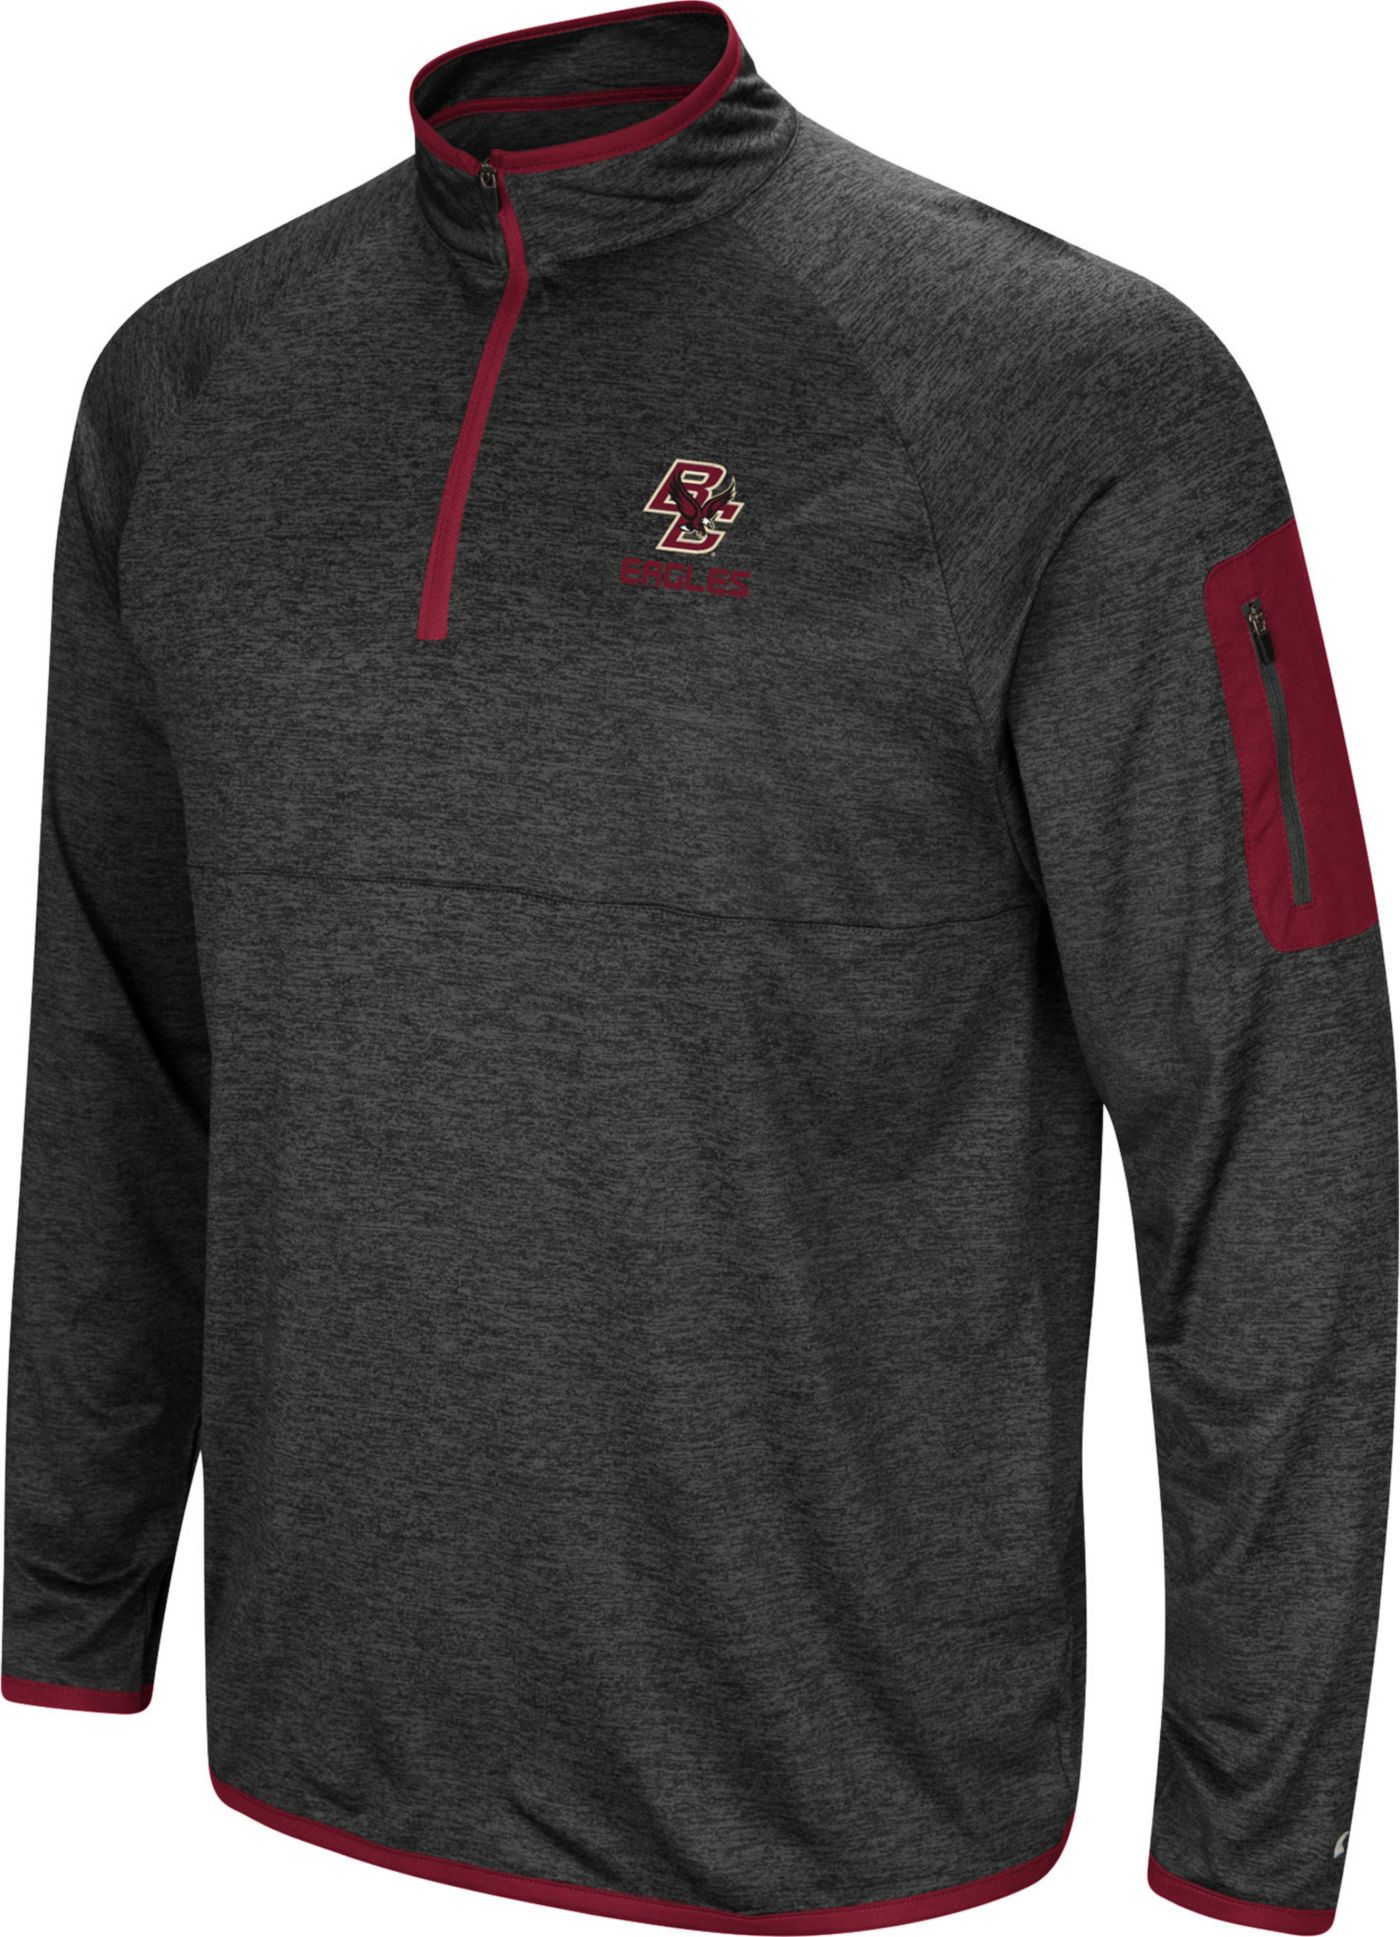 Colosseum Men's Boston College Eagles Indus River Quarter-Zip Black Shirt